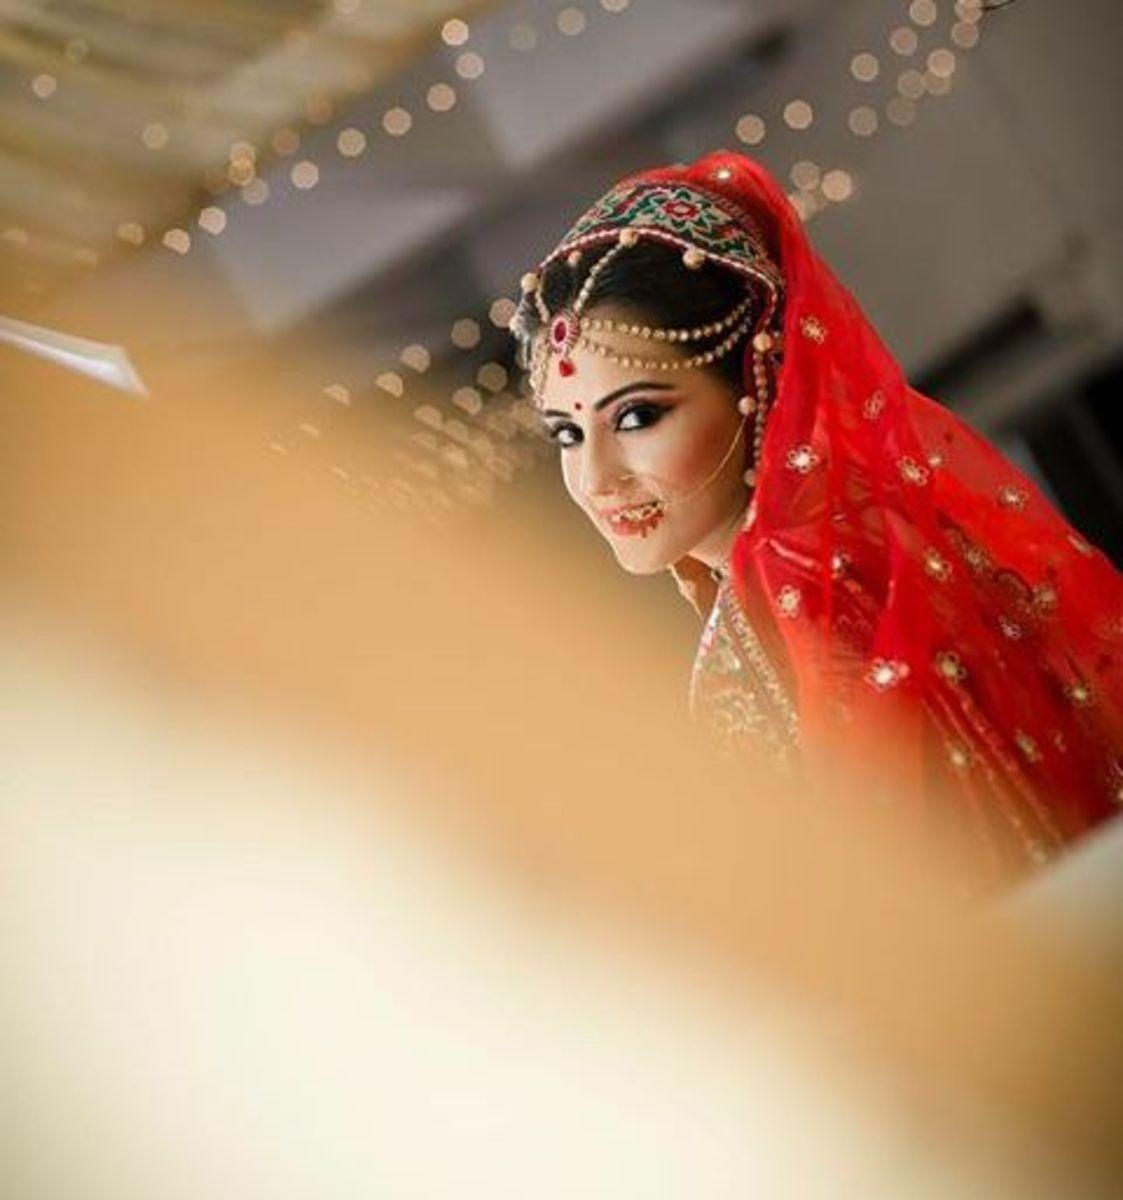 Bride posing at her wedding.